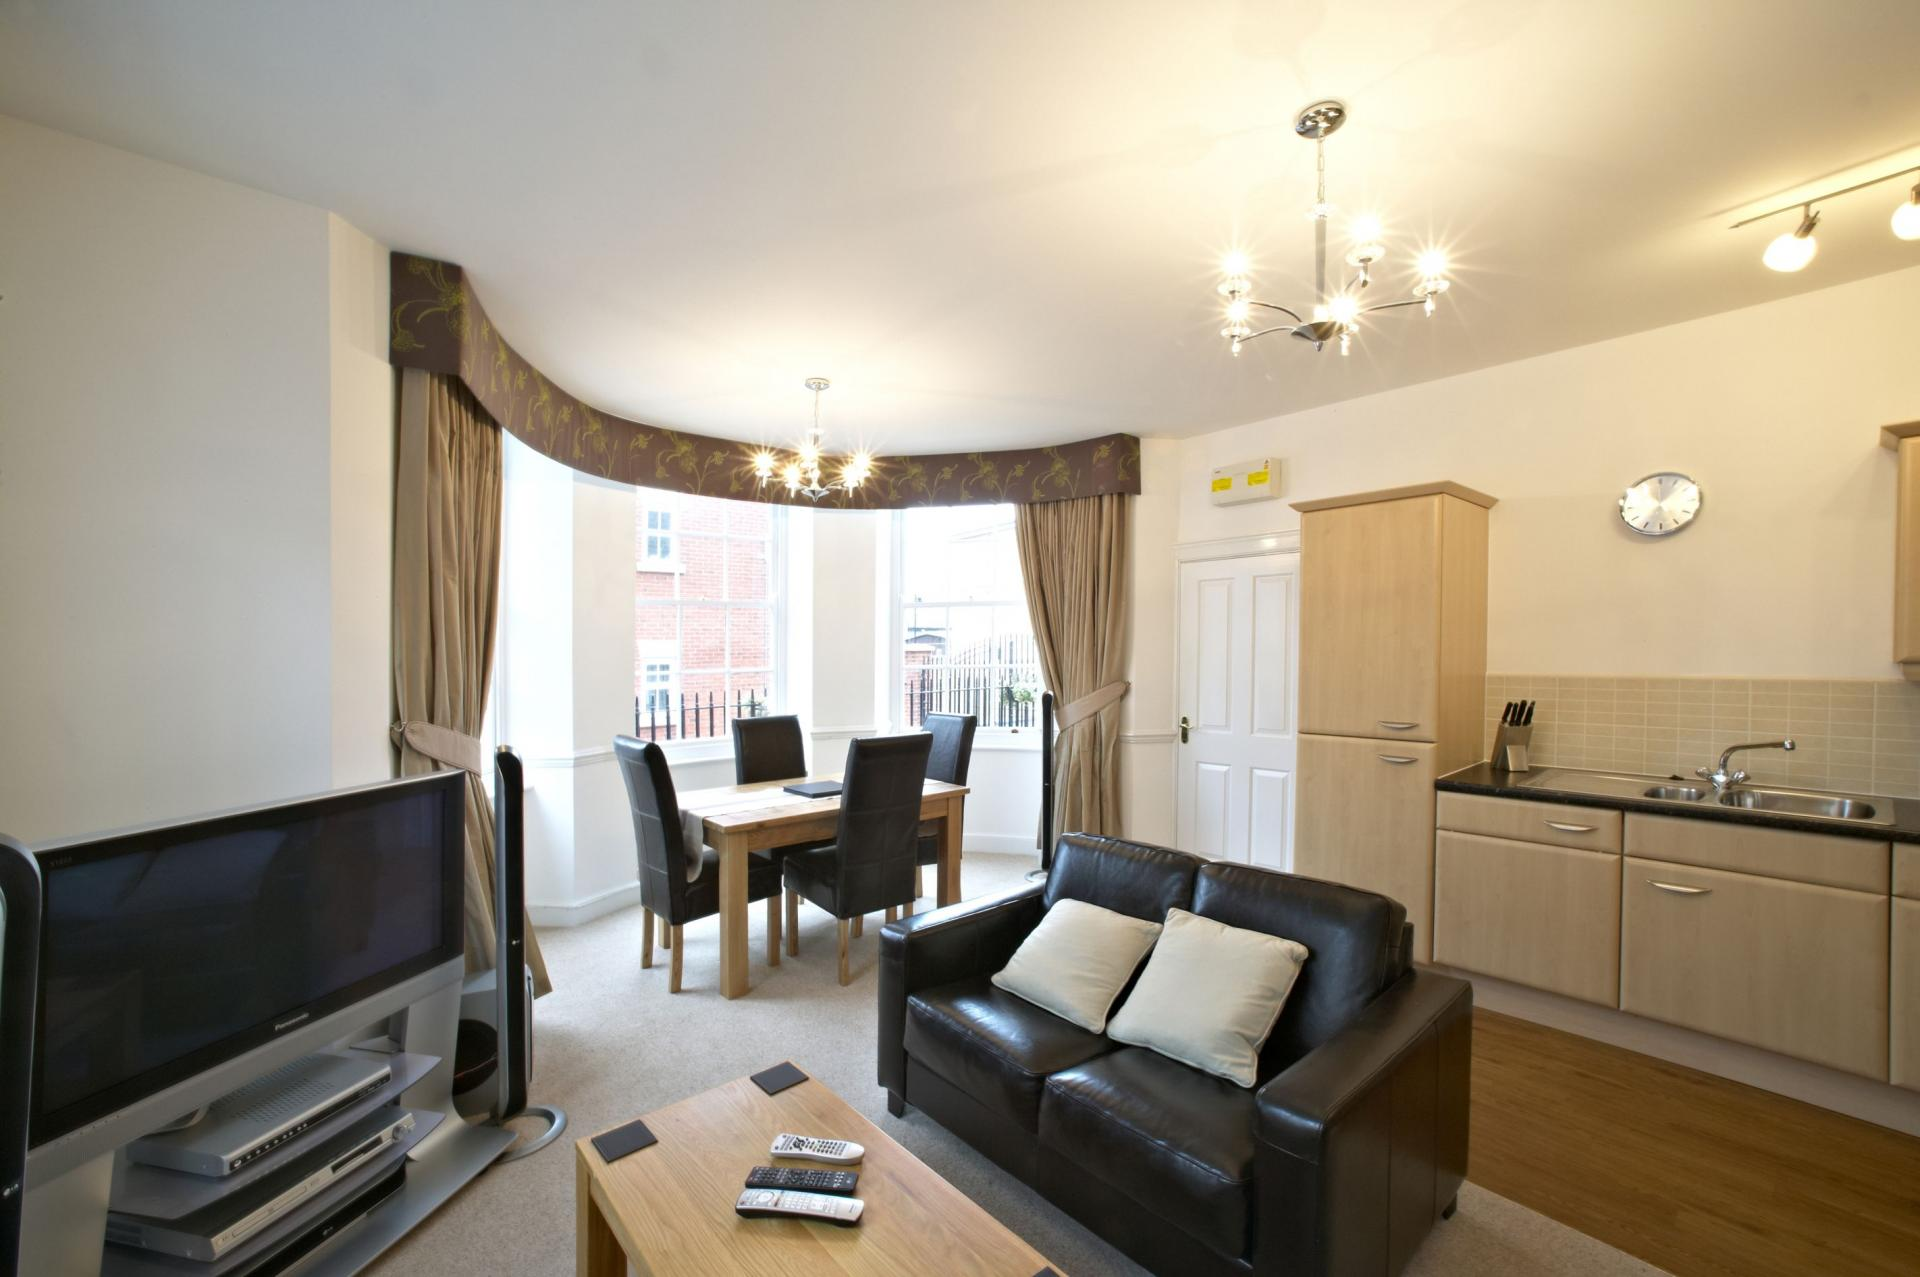 Lounge at Villetts House Apartment, Centre, Swindon